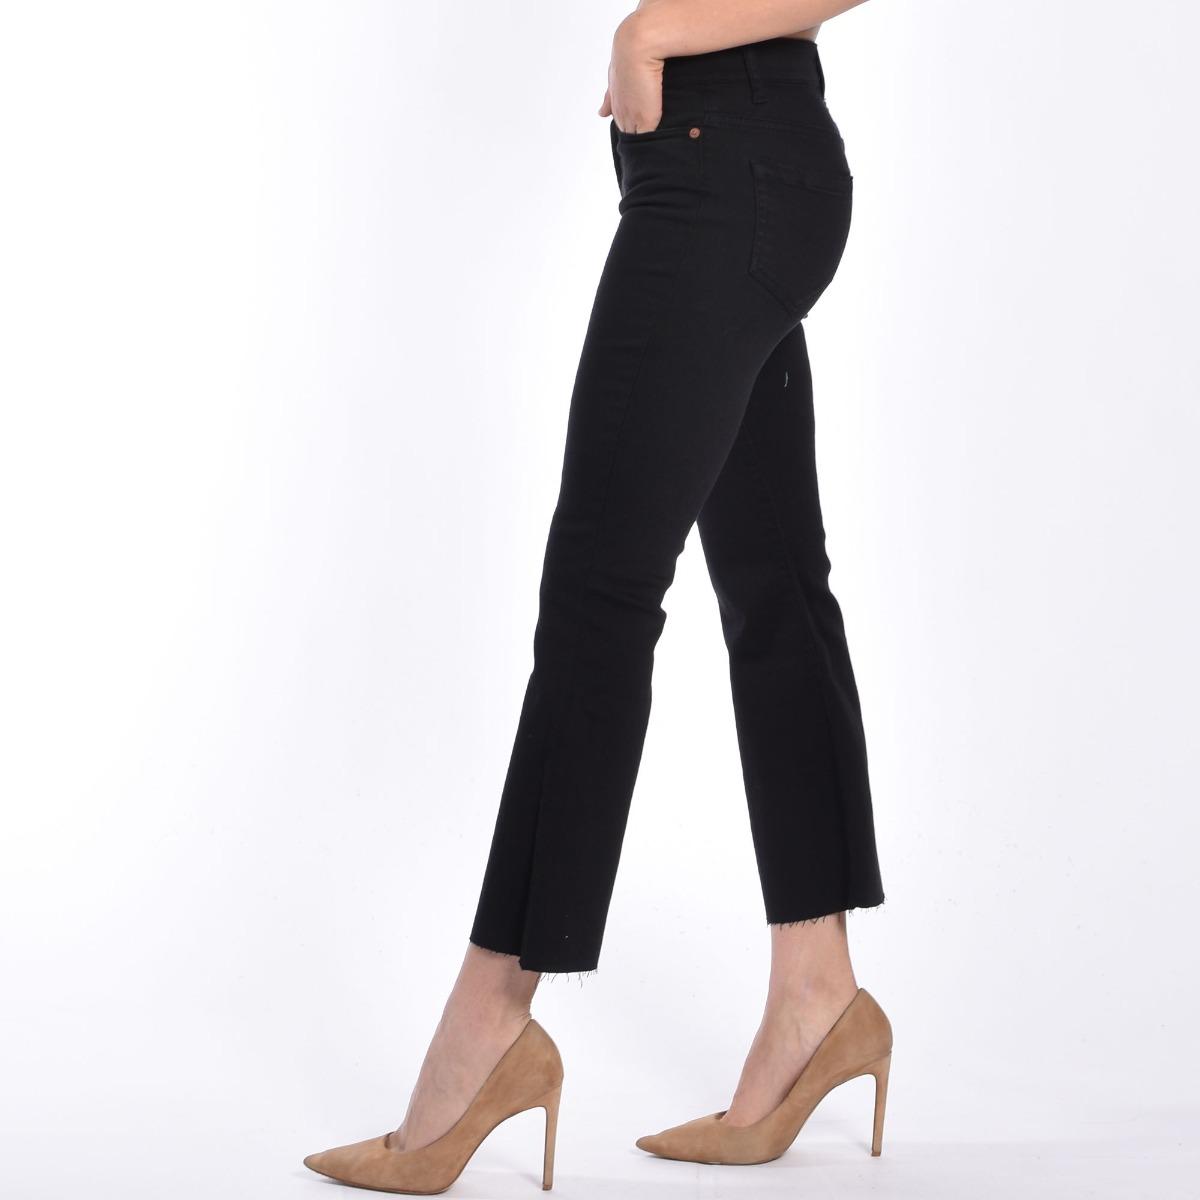 Jeans trombetta - Denim nero